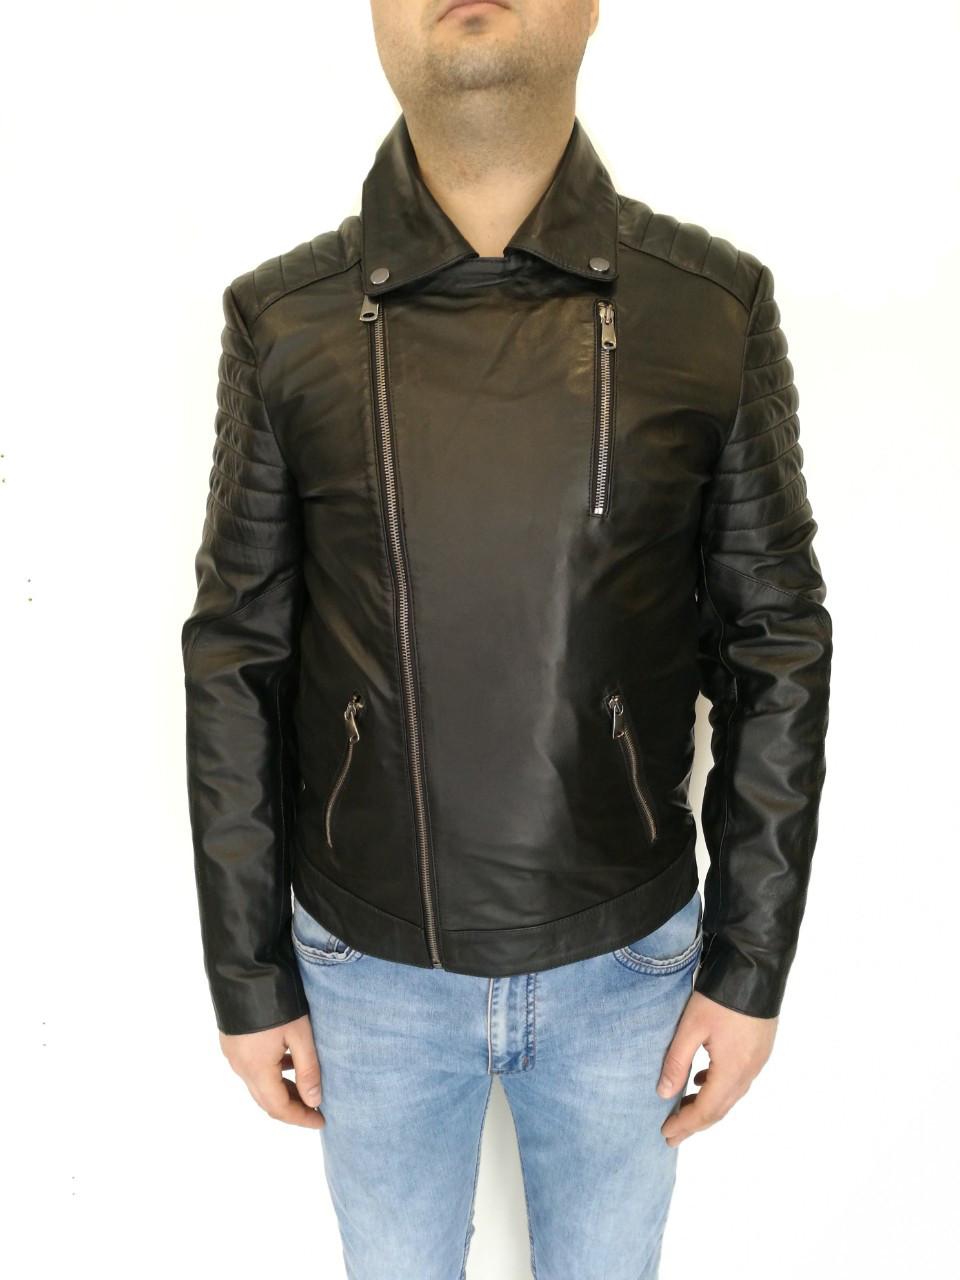 Курткаиз натуральной овчины.  / man jacket 455